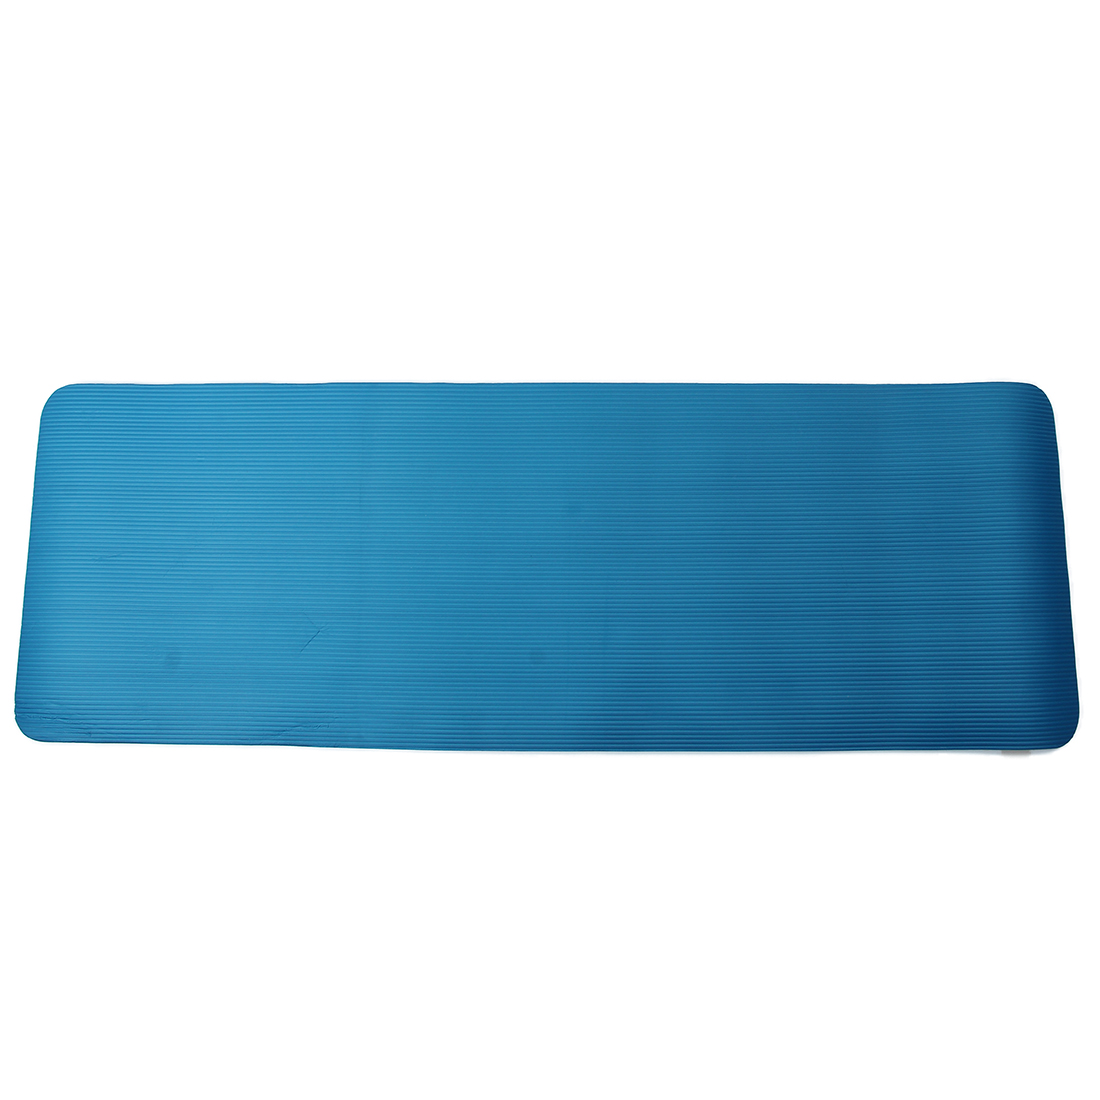 Yoga Mat 15mm Thick Exercise Fitness Physio Pilates Gym Mat Non Slip Crash Mat, Blue eva exercise pad thick non slip folding gym fitness mat eva yoga mat pilates supplies non skid floor 4 colors mat